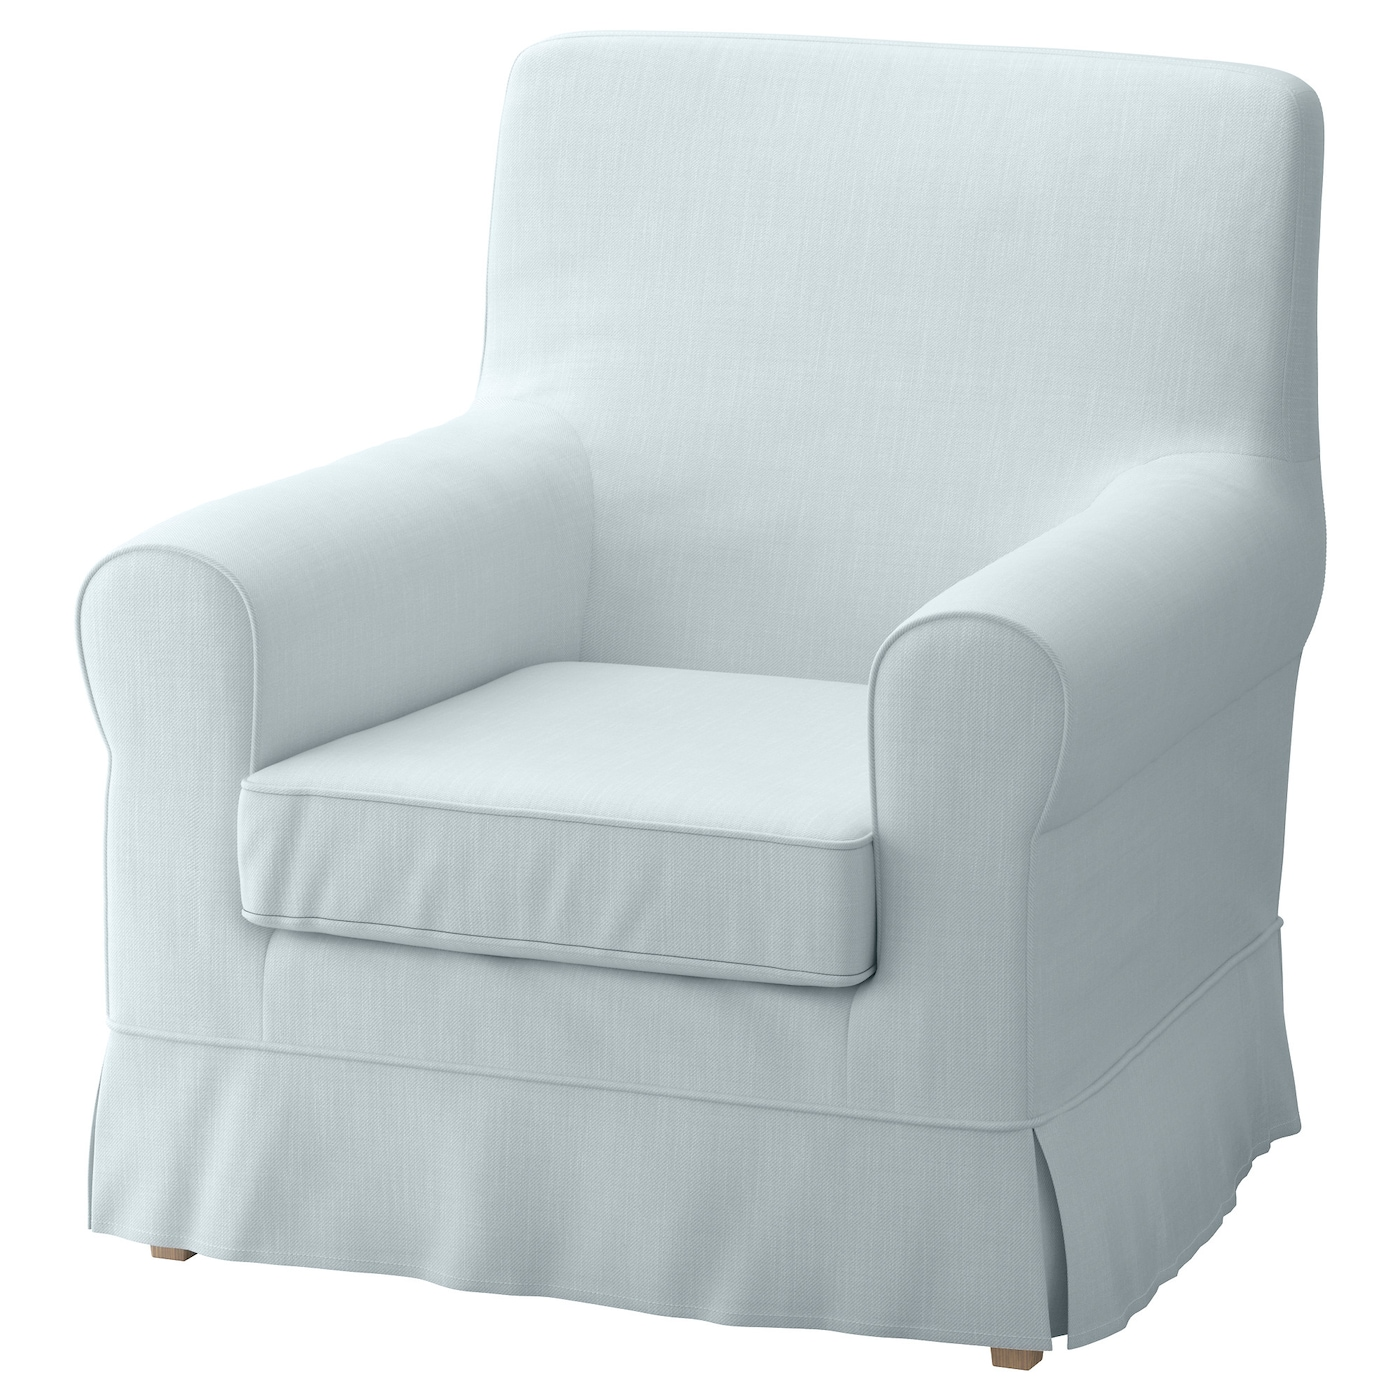 IKEA JENNYLUND Armchair